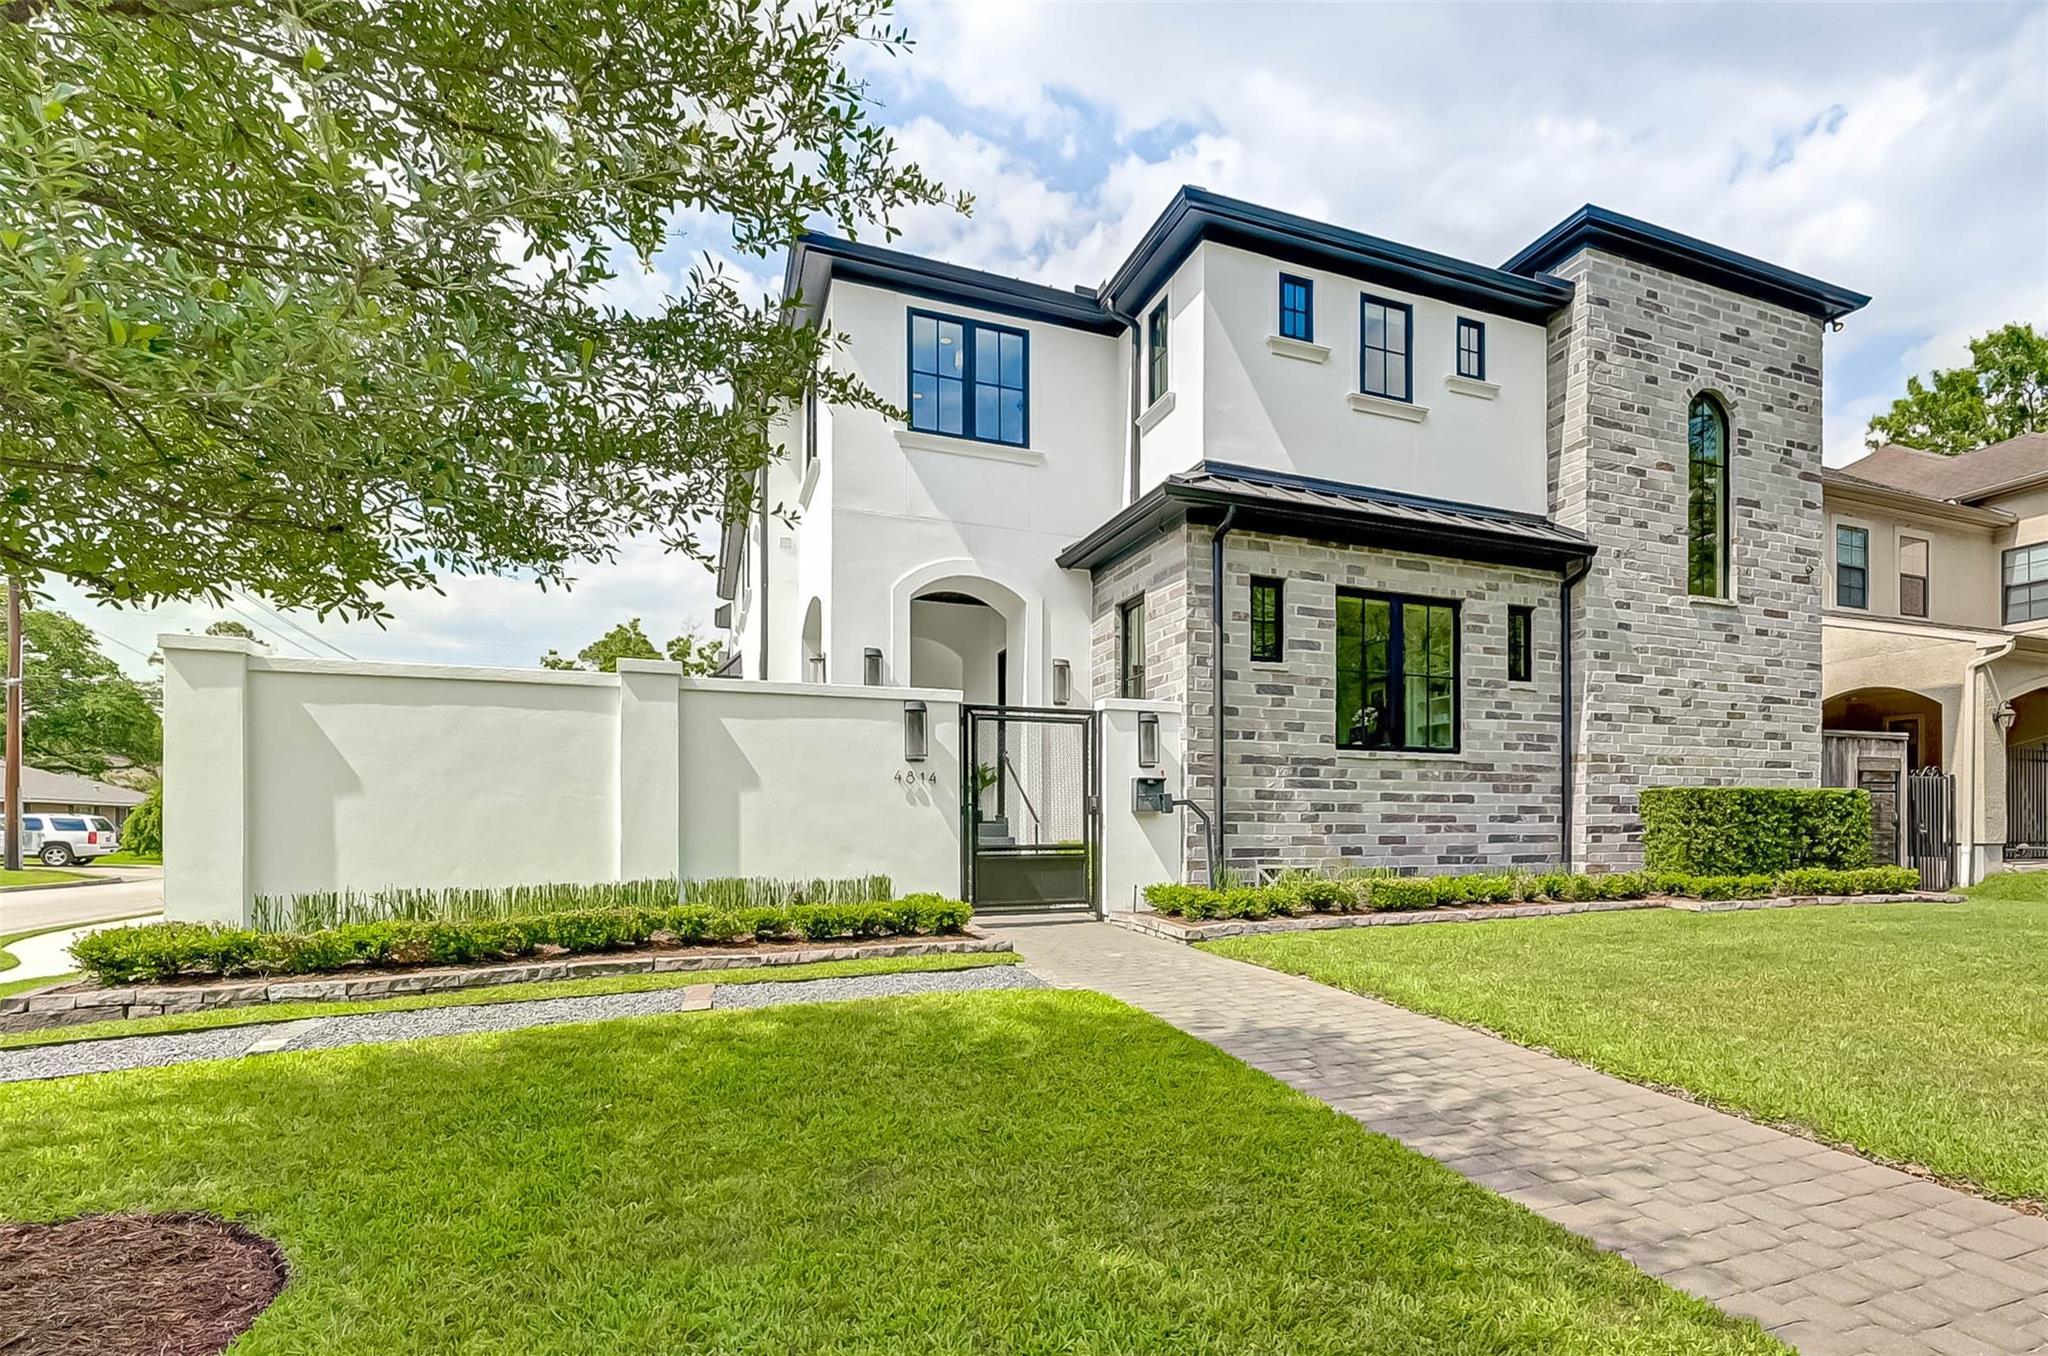 4814 Holly Street Property Photo 1